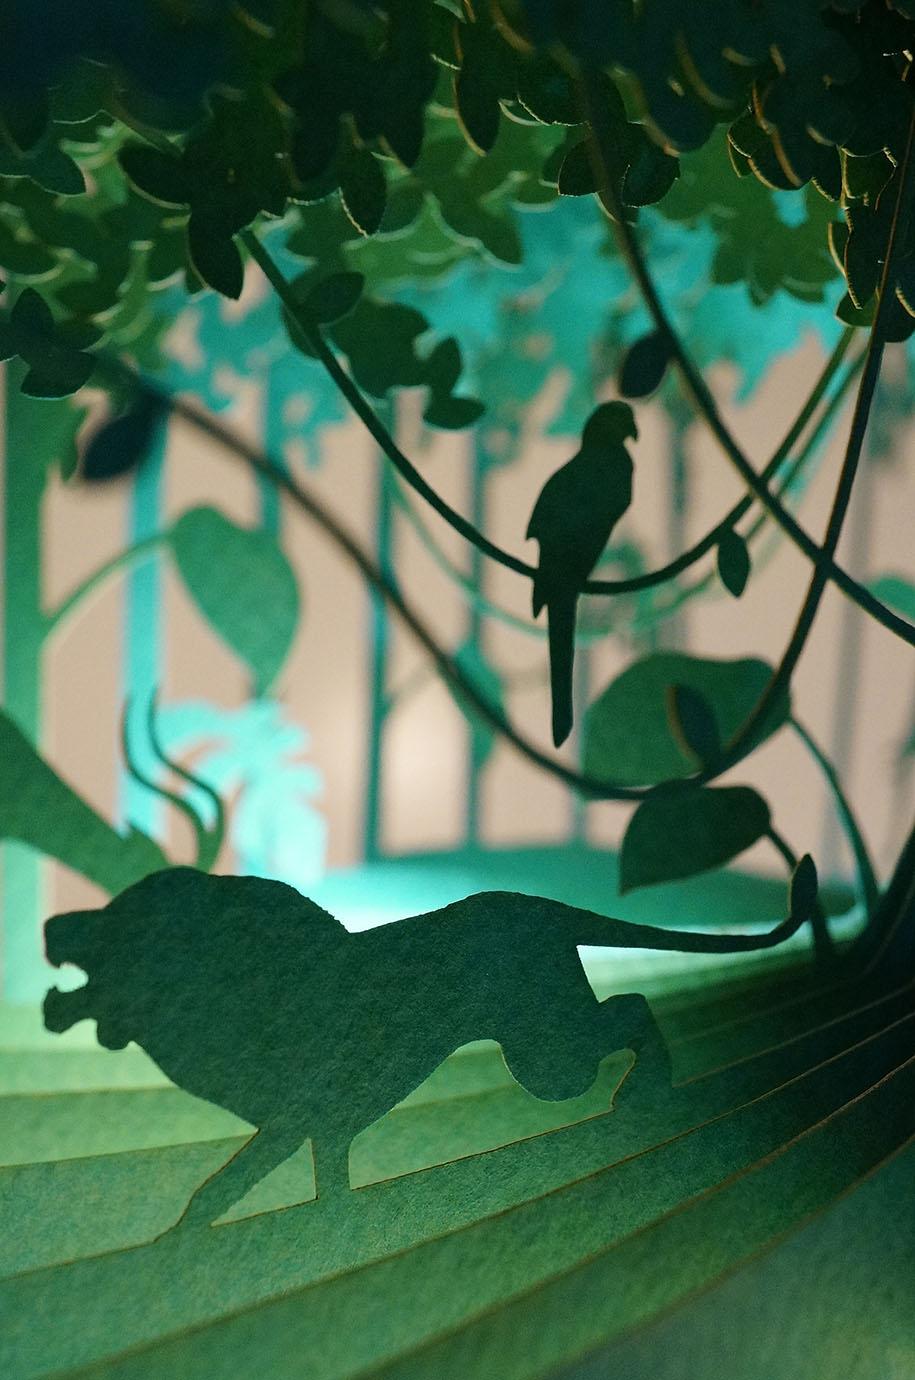 360-degree-cut-books-illustrations-fairy-tales-yusuke-oono-11